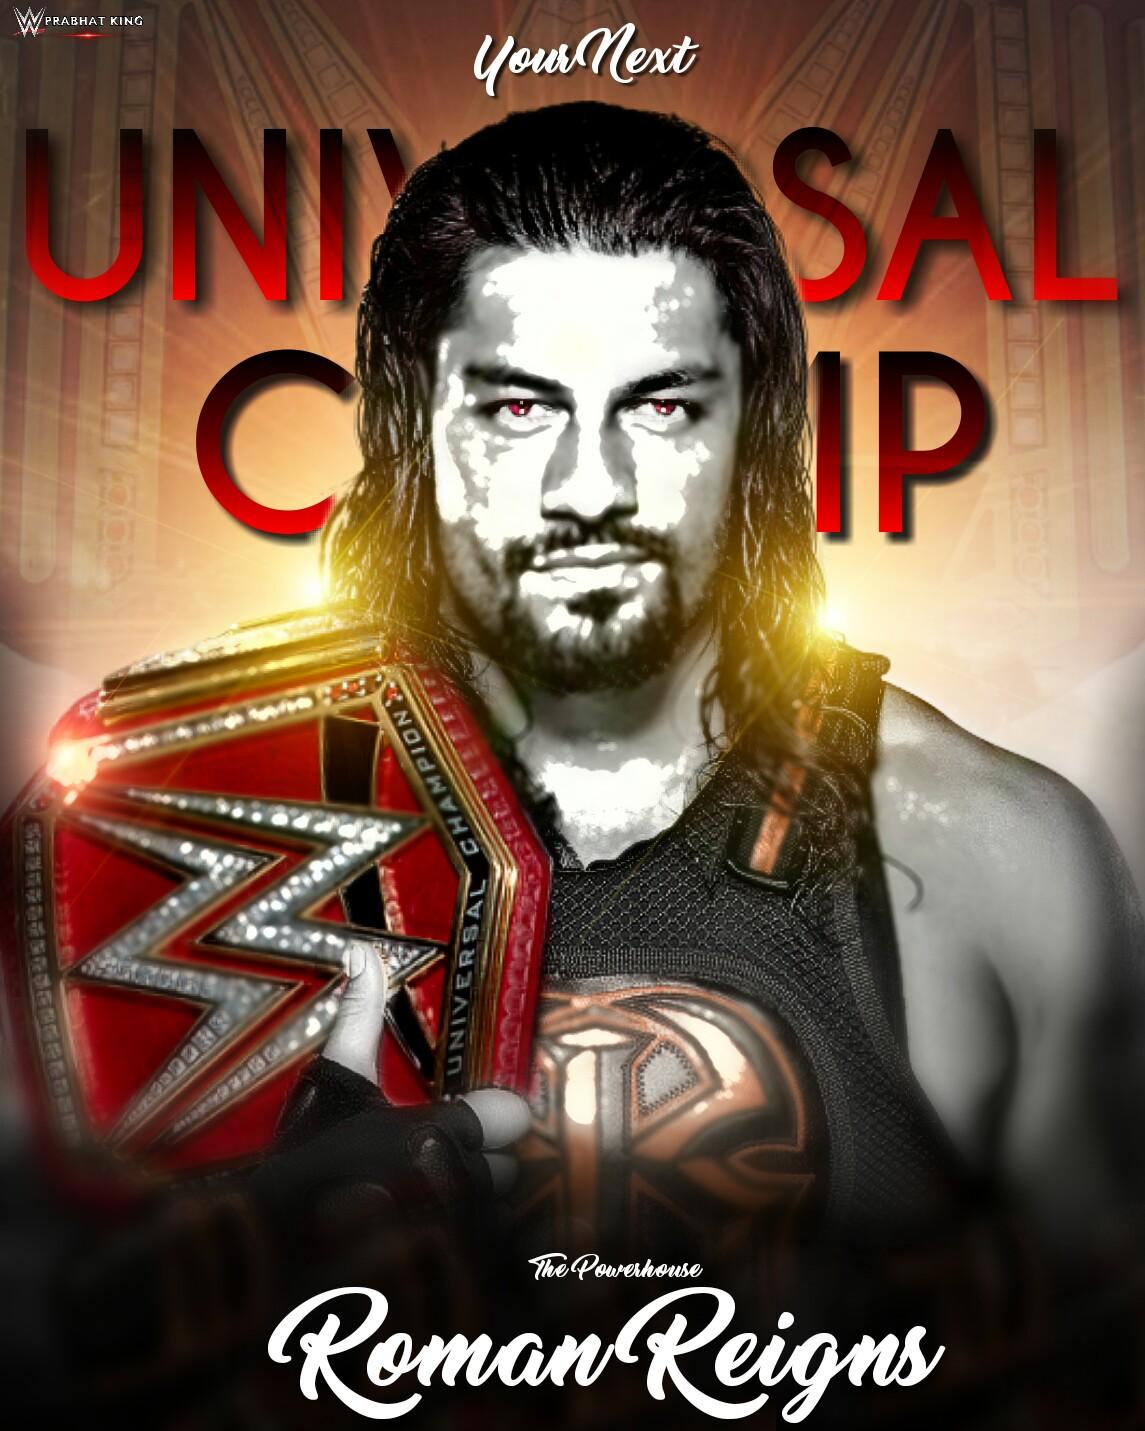 Your Next UNIVERSAL Champ